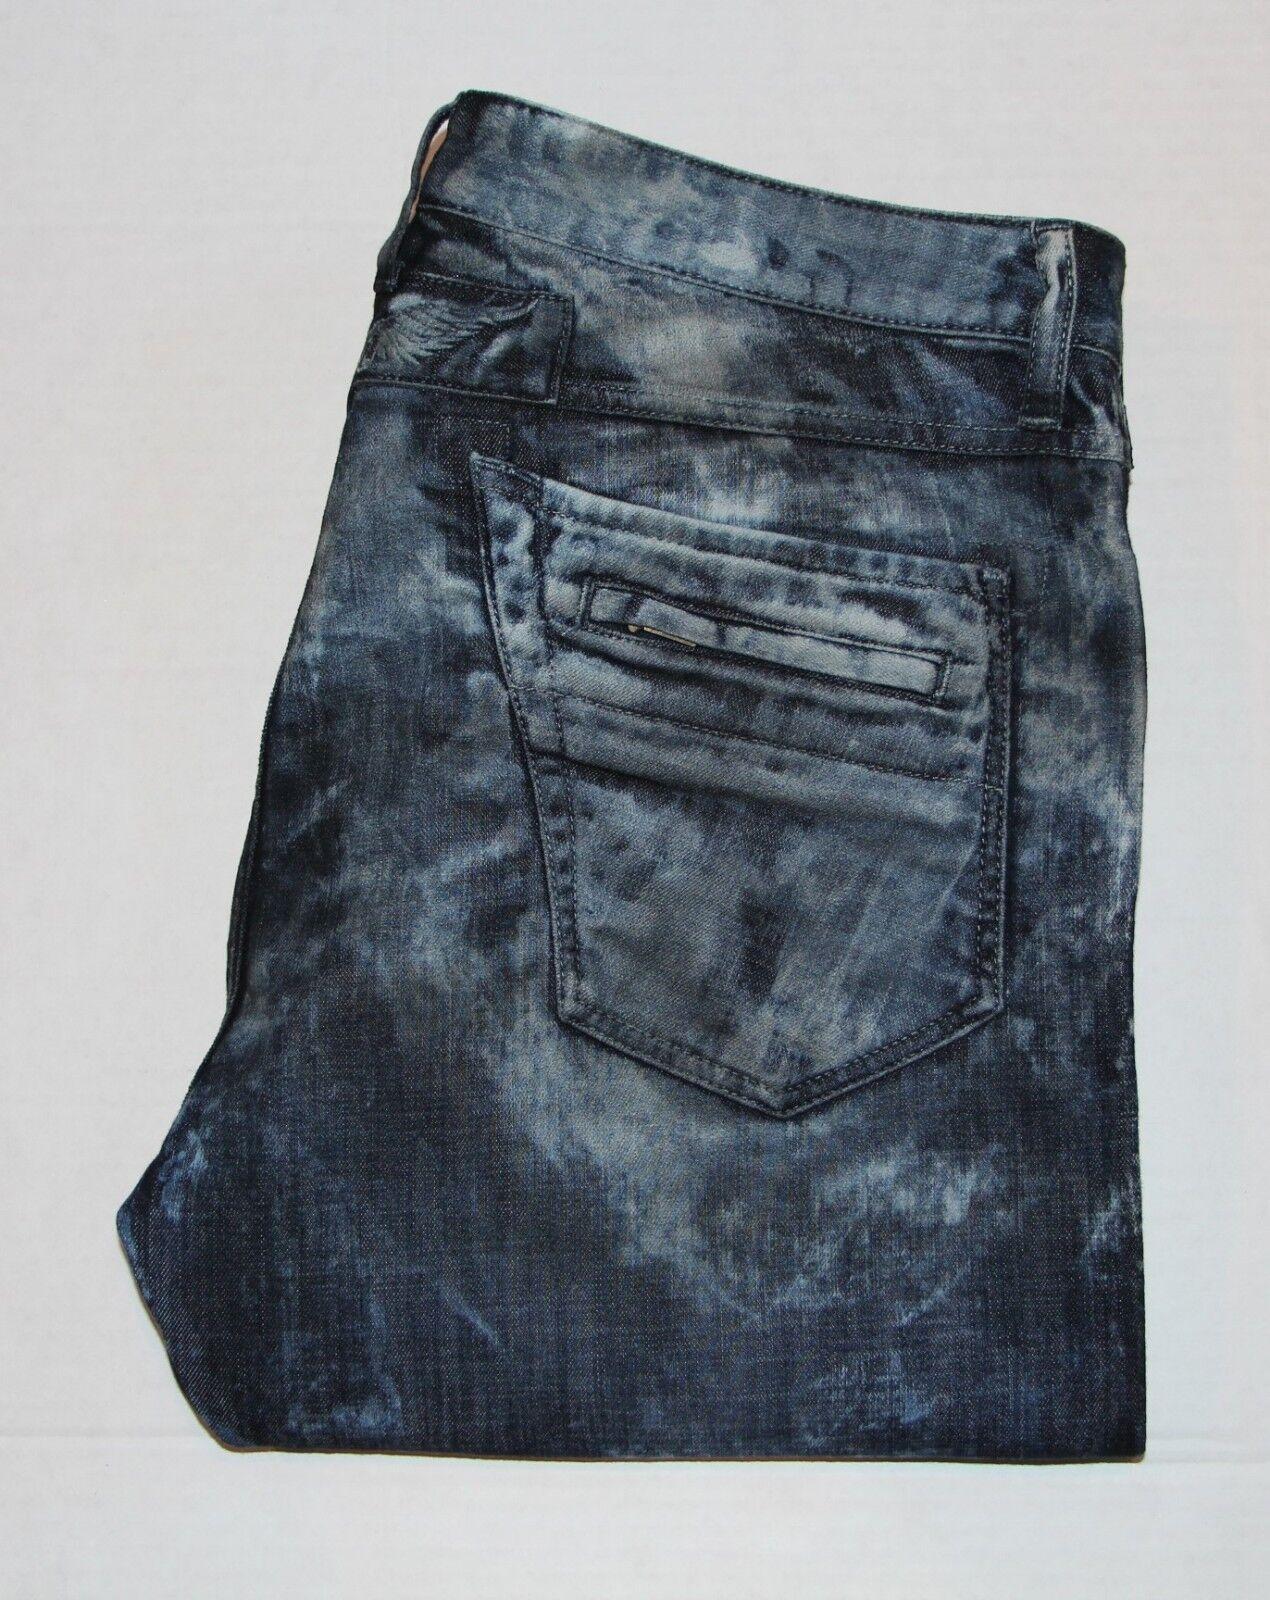 New Men's ROBIN'S JEAN sz 40 Style  SPAC5475 MOTARD -Acid Wash Jeans